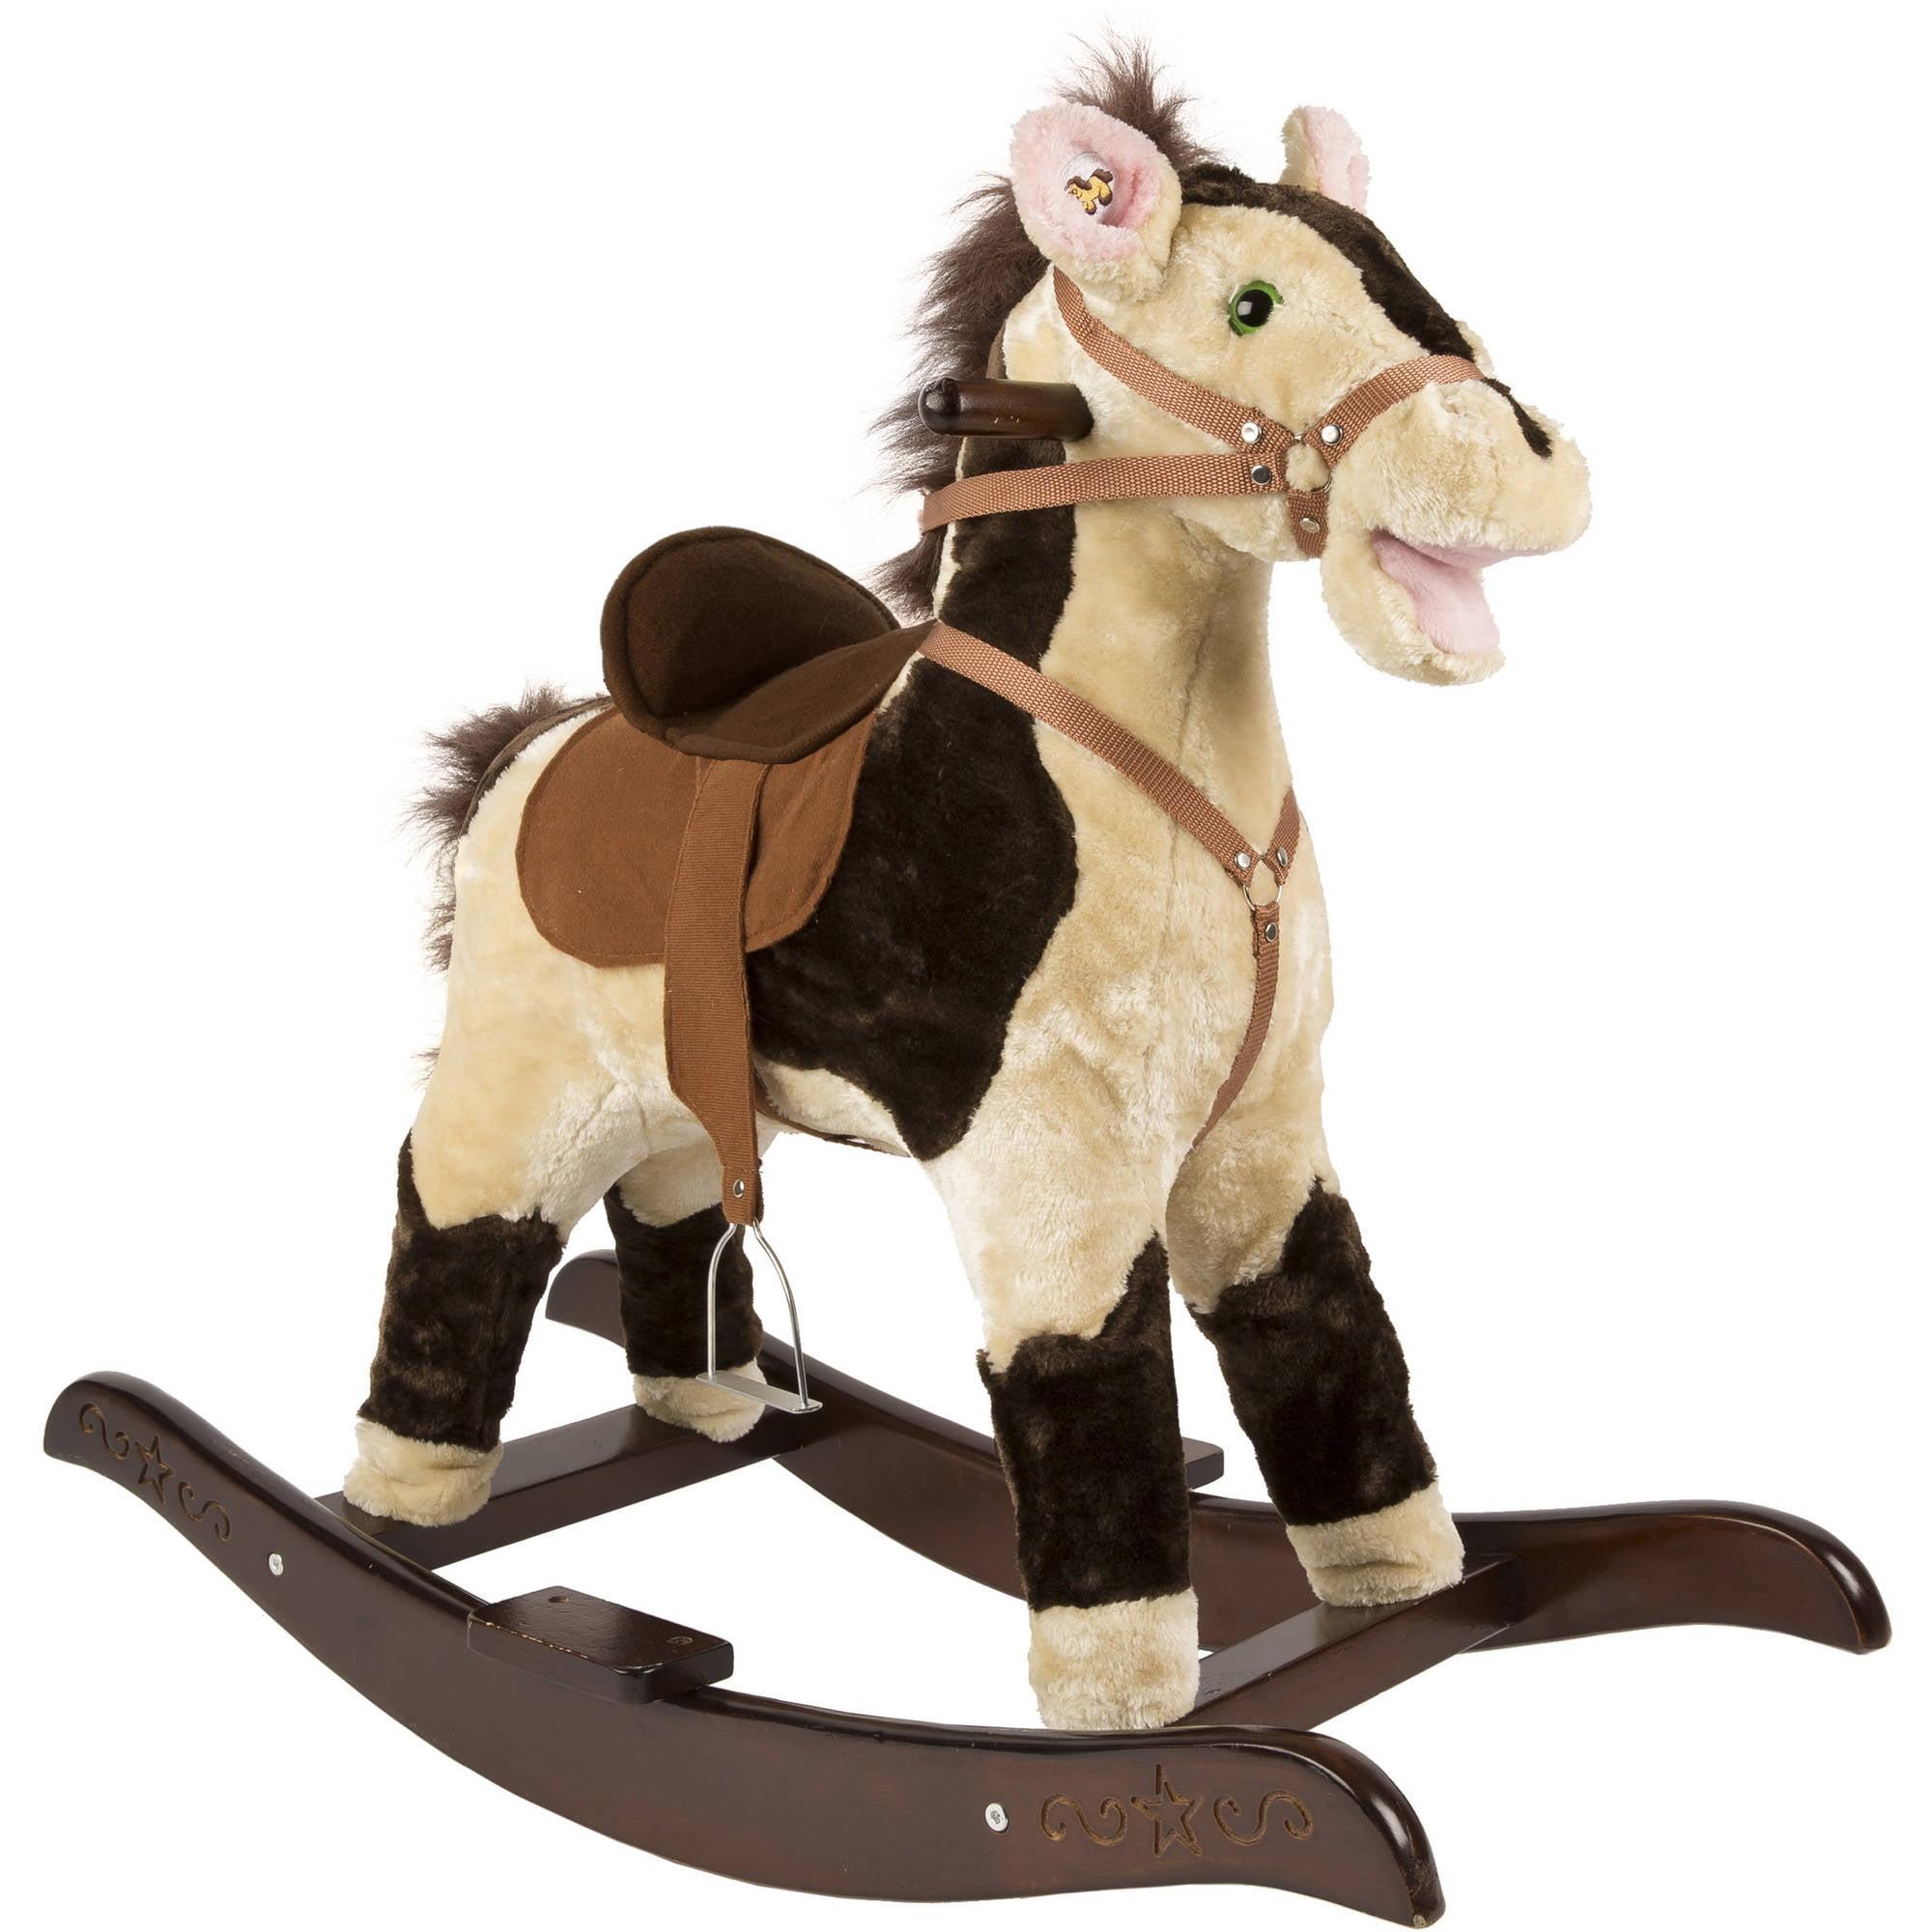 rockin' rider sheriff rocking horse  walmartcom -